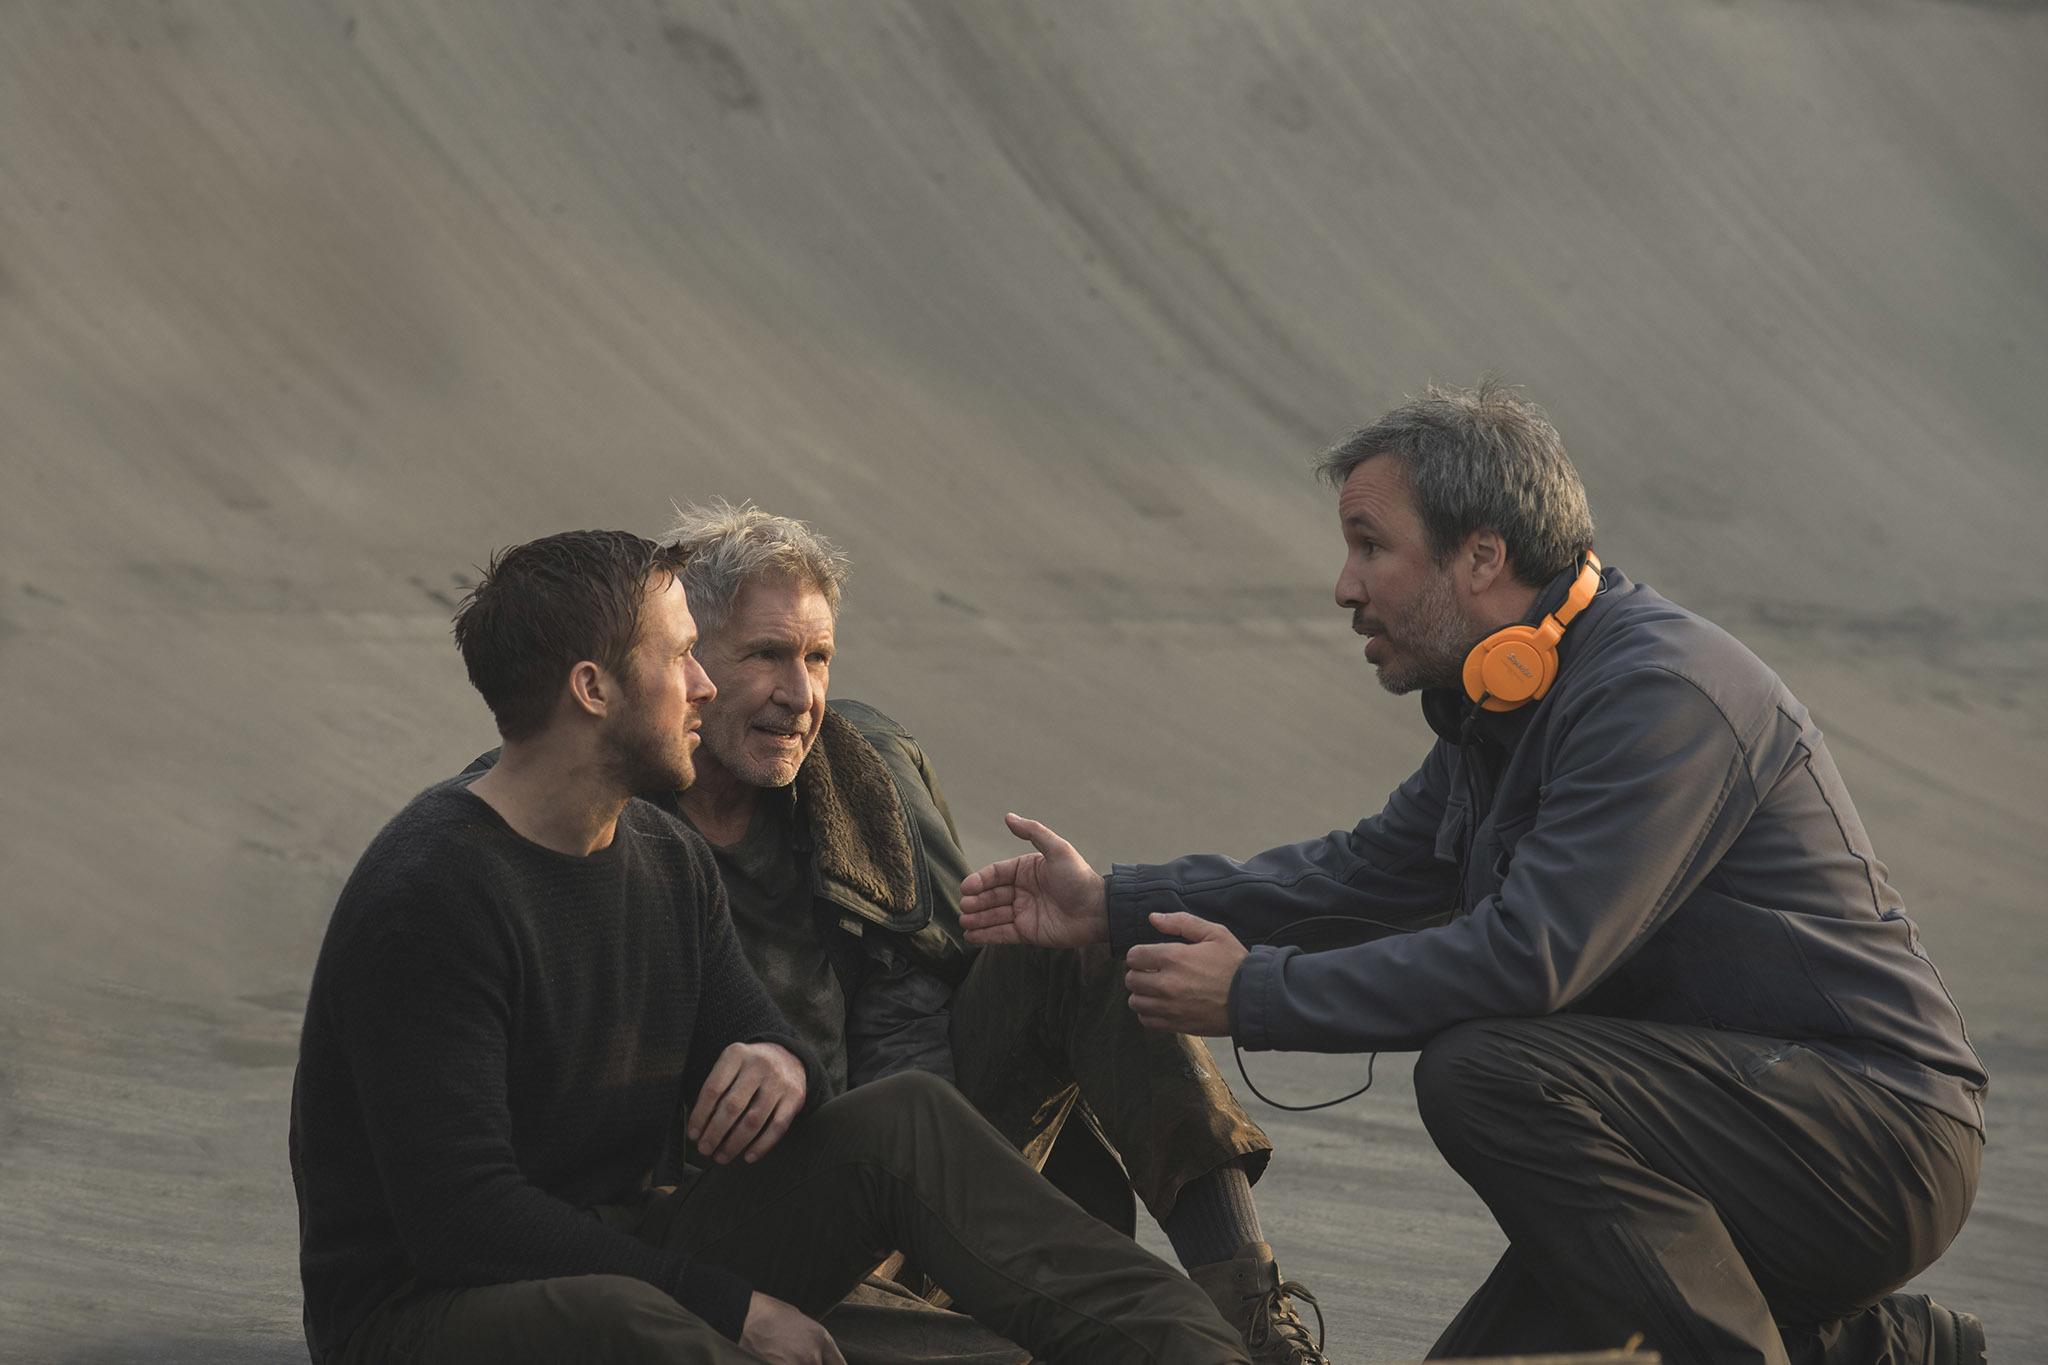 Director Denis Villeneuve and cinematographer Roger Deakins on making Blade Runner 2049